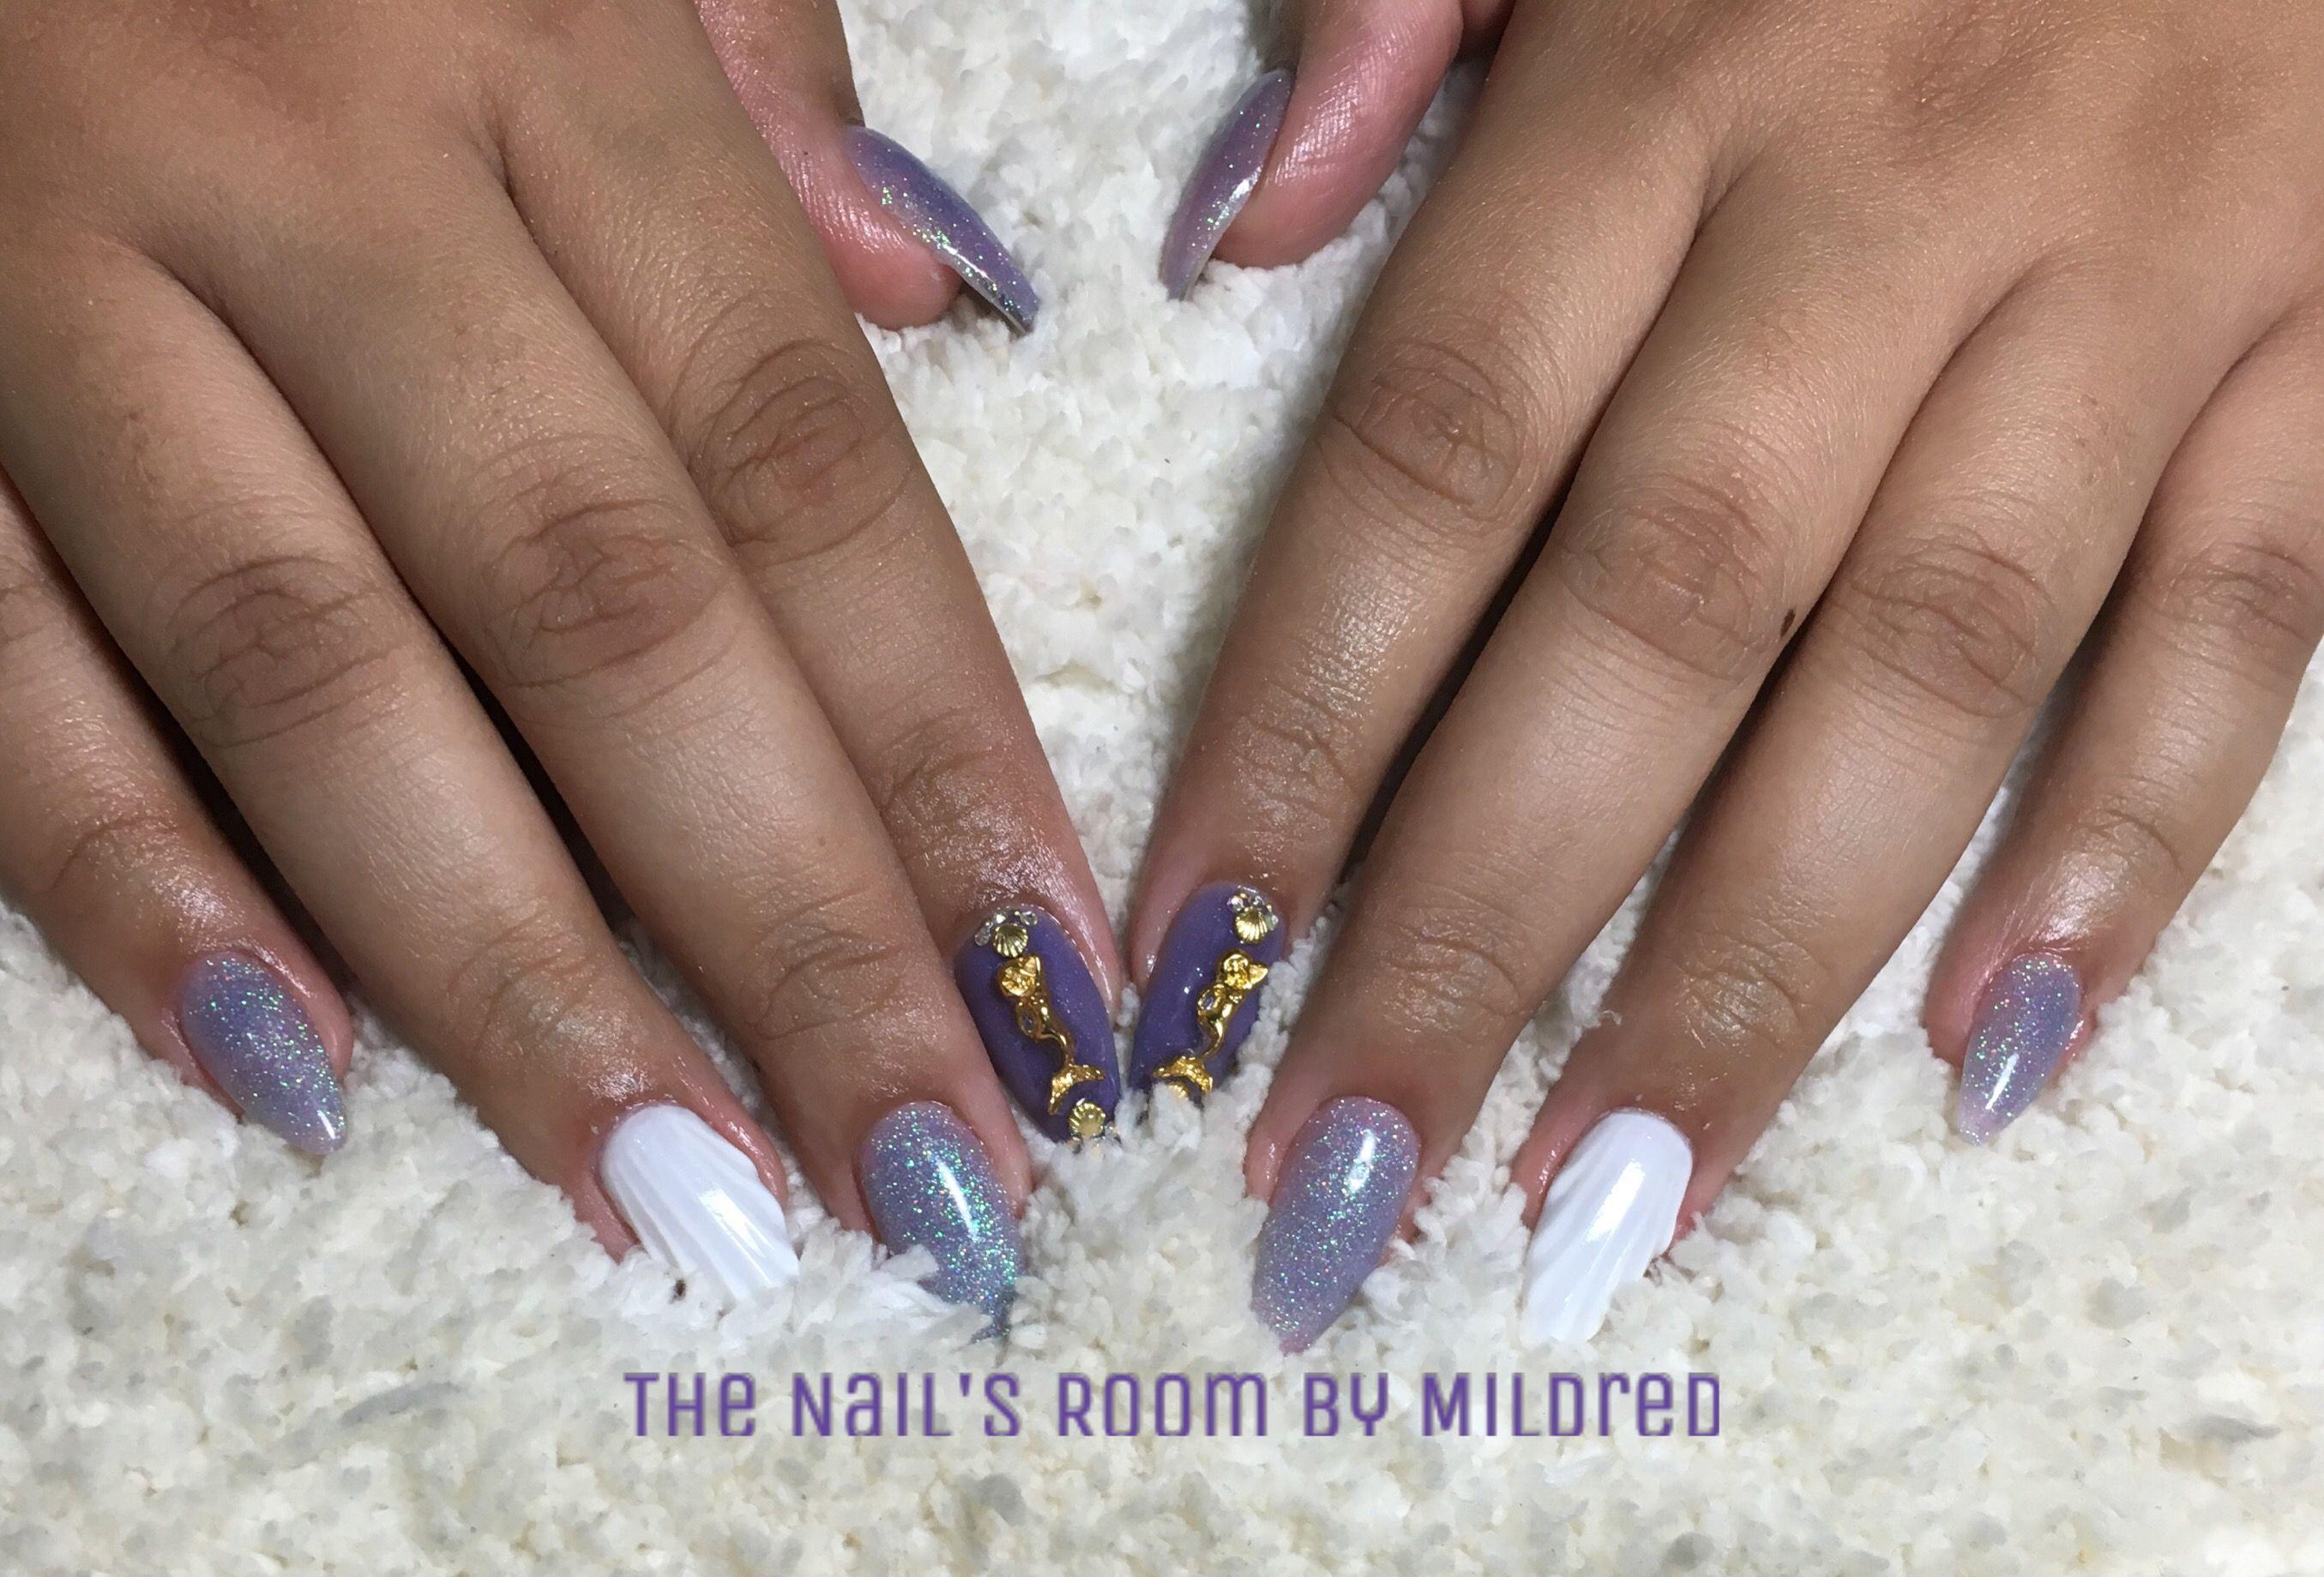 Lets enjoy summer a little longer 🤗 @youngnailsinc powders, white kaleidoscope gel and finish gel, custom glitter mix by me. #thenailsroom Simple two tone with 3d flowers💗 #thenailsroom #uñas #uñasacrilicas #uñasdecoradas #nails #acrylicnails #almondnails #whitenails pueplenails #claws #mermaid #summernails #gel #alloy #crystals #yn #cute #nailporn #nailpro #nailpromote #nailprodigy #nailpromagazine #nailsmagazine #nailsofinstagram #instanails #NAILDIT💅